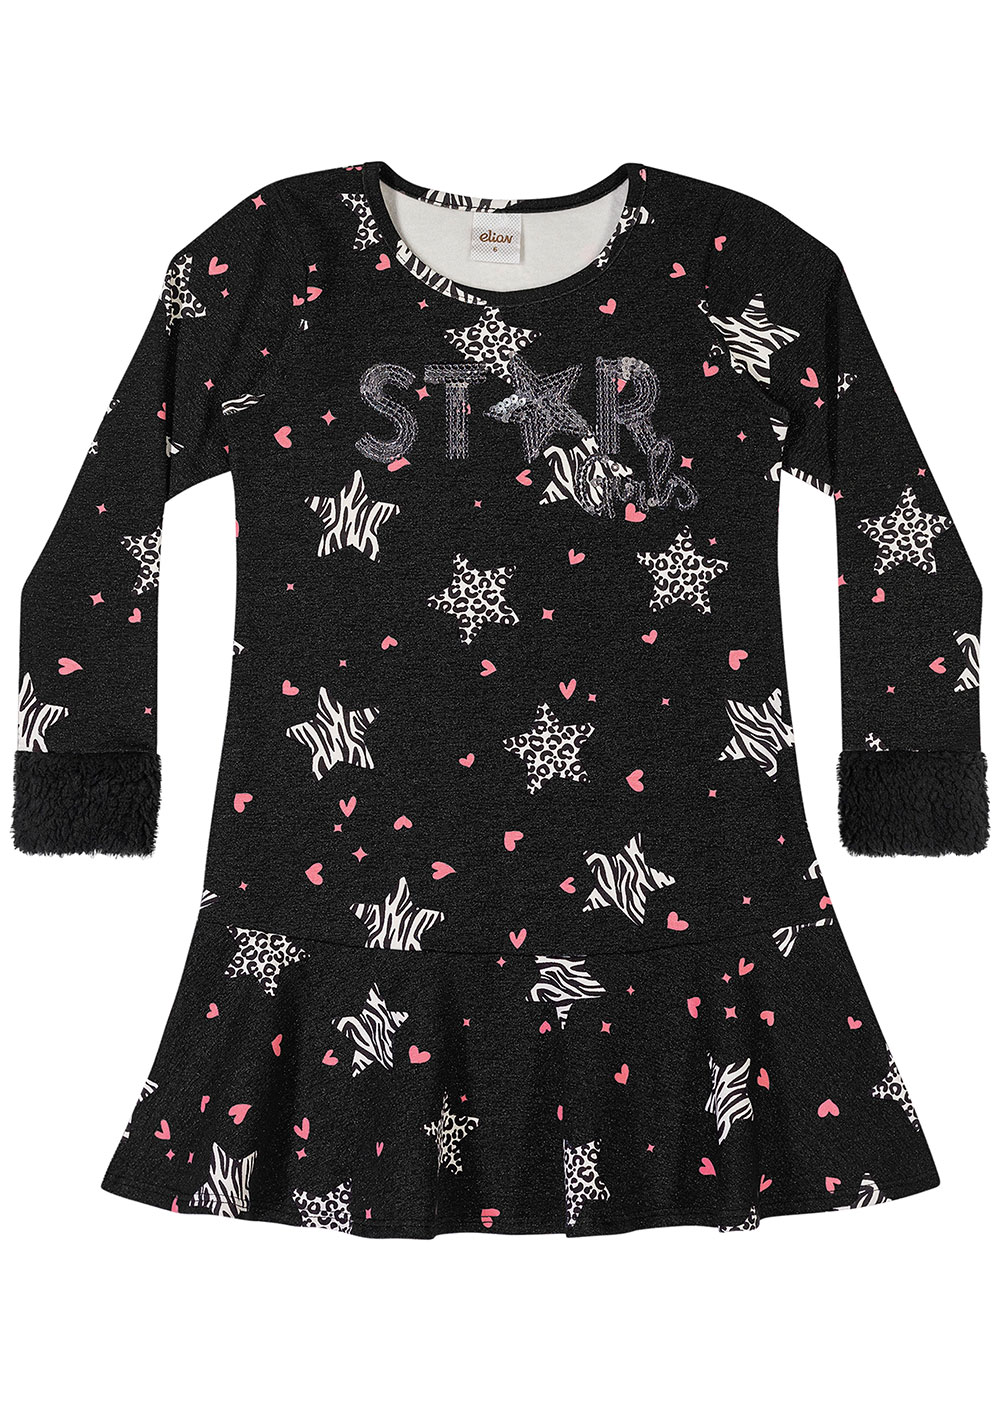 Vestido Infantil Feminino Inverno Cinza Stars - Elian